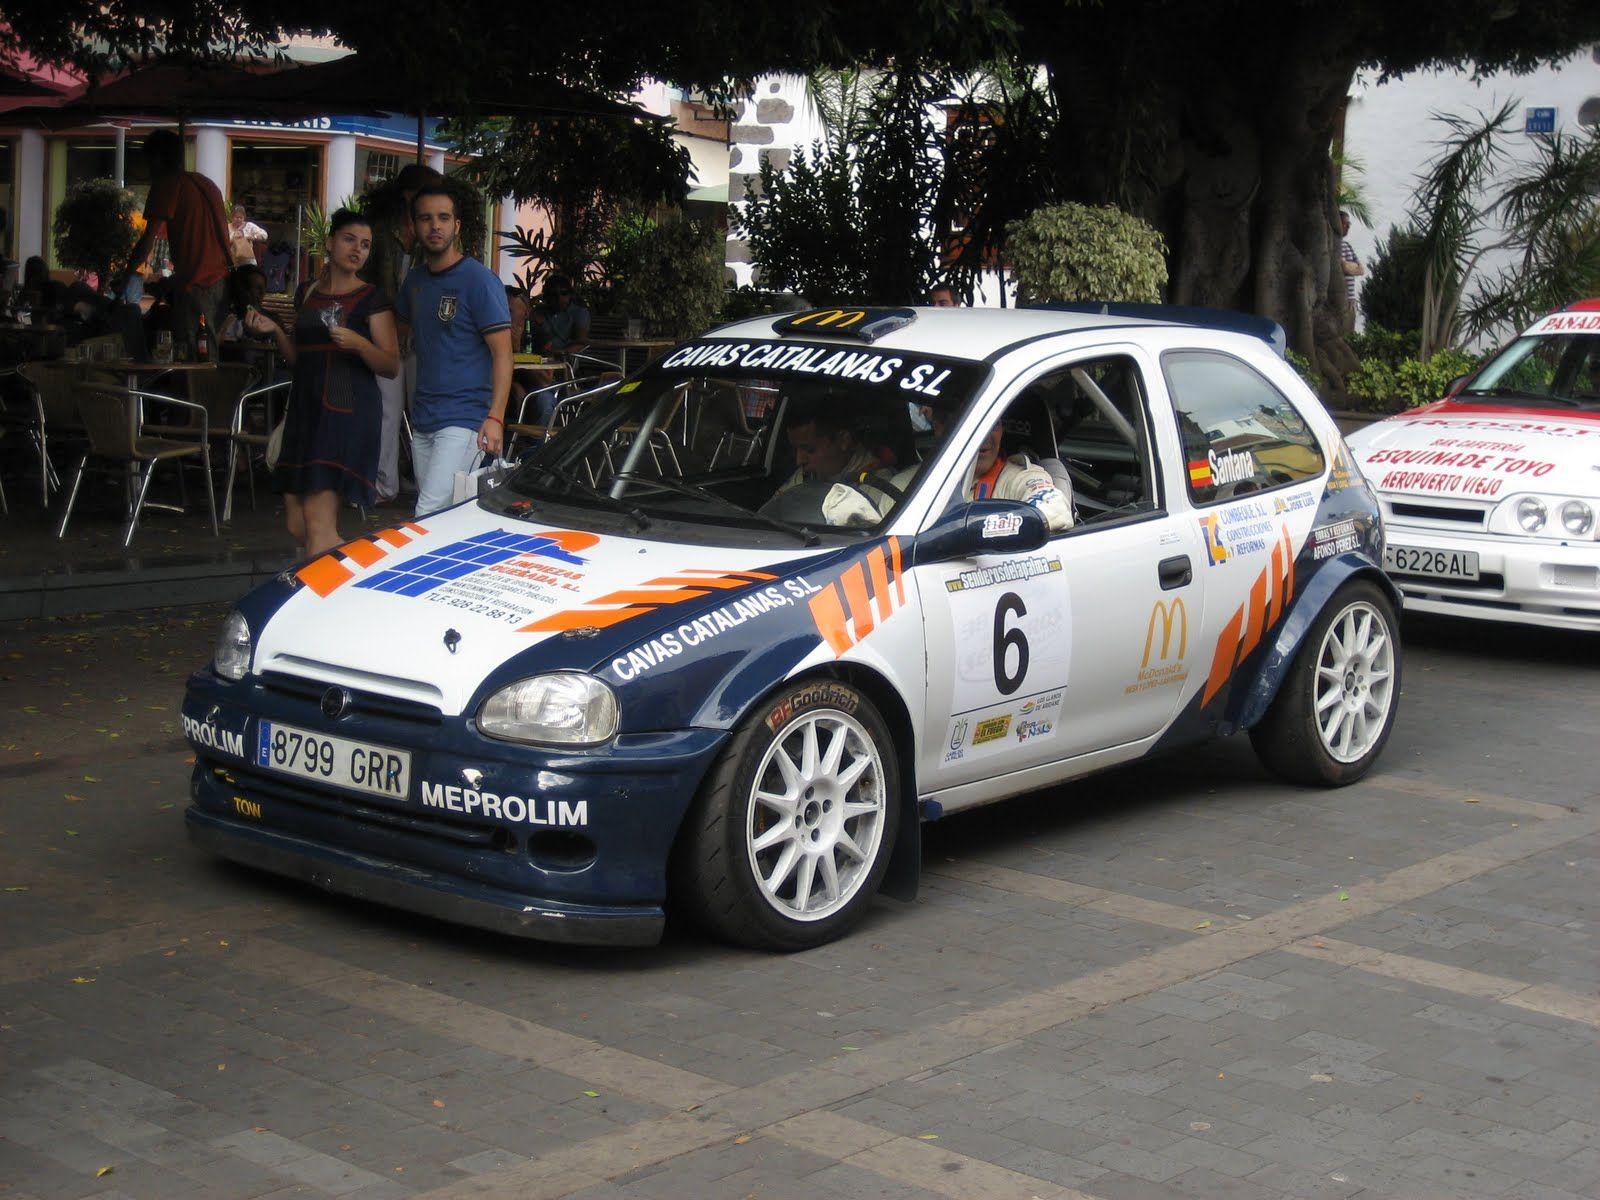 Opel Corsa B Kit Car | All Racing Cars | Opel corsa, Rally car racing,  Vauxhall corsa